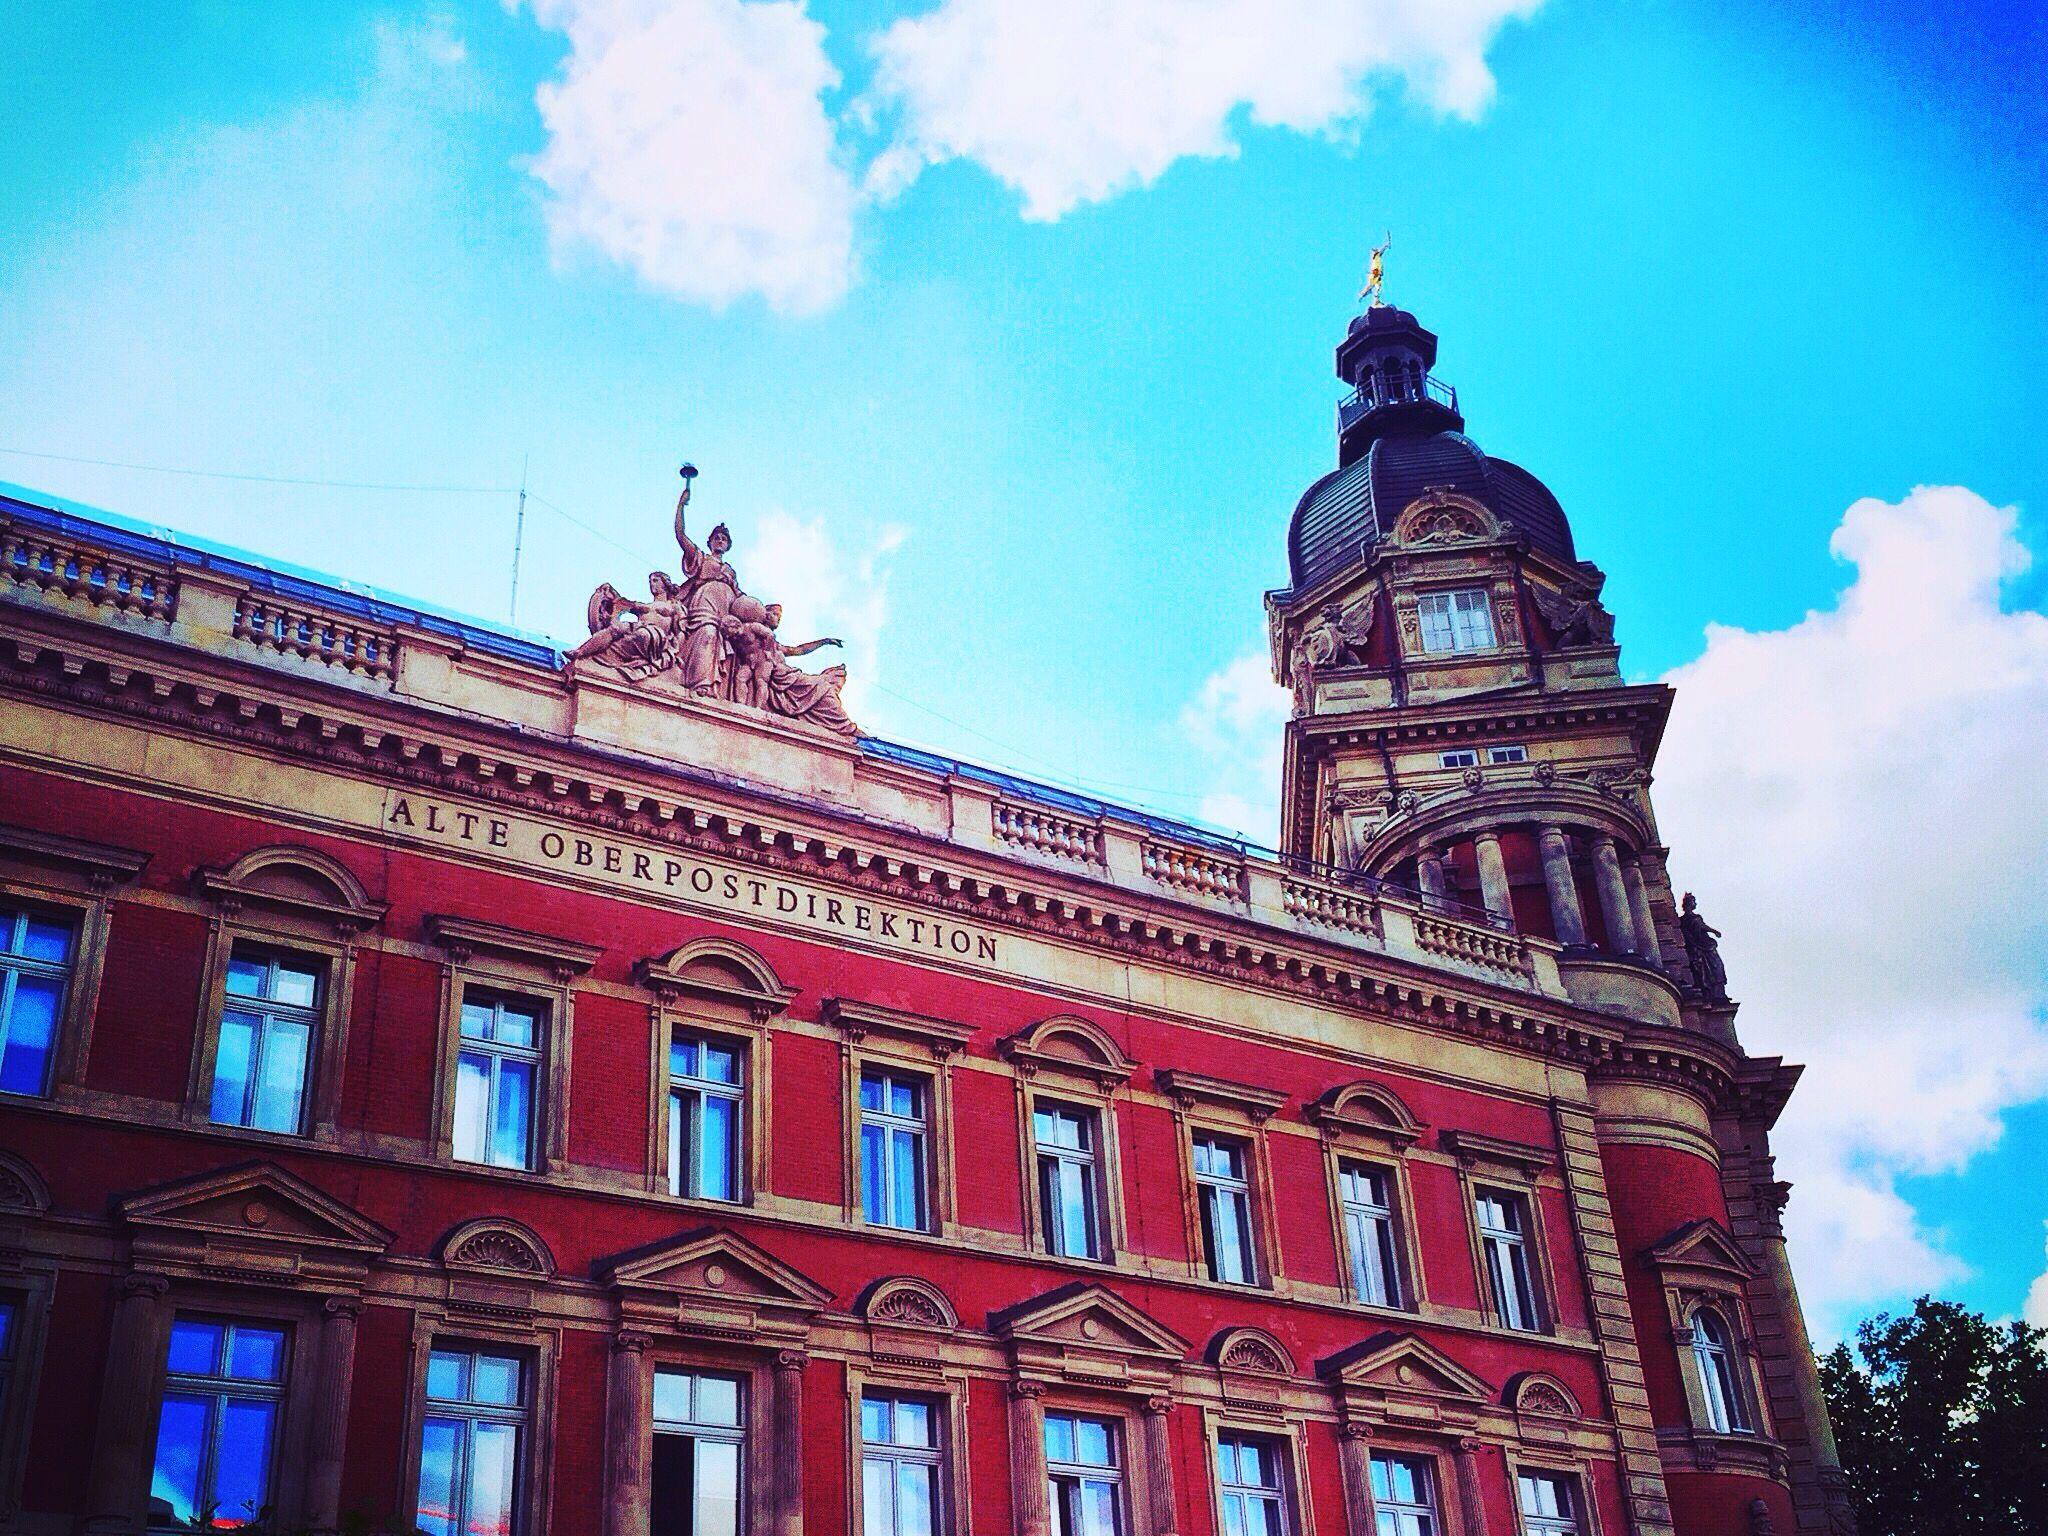 Oberpostdierektion Hamburg